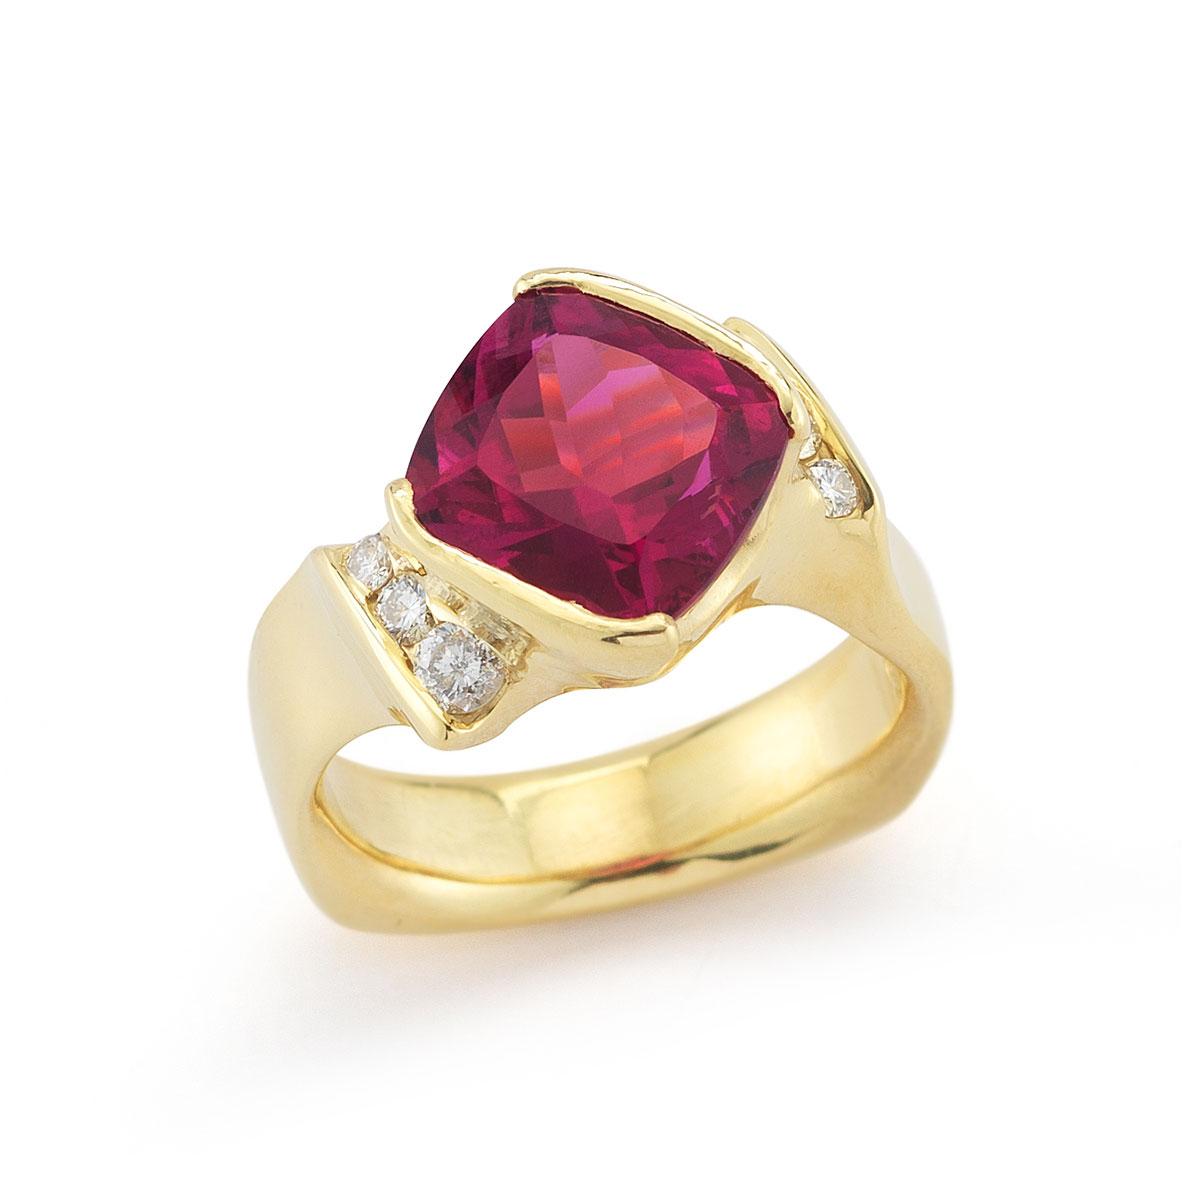 IND0979 Rubellite Tourmaline Ring